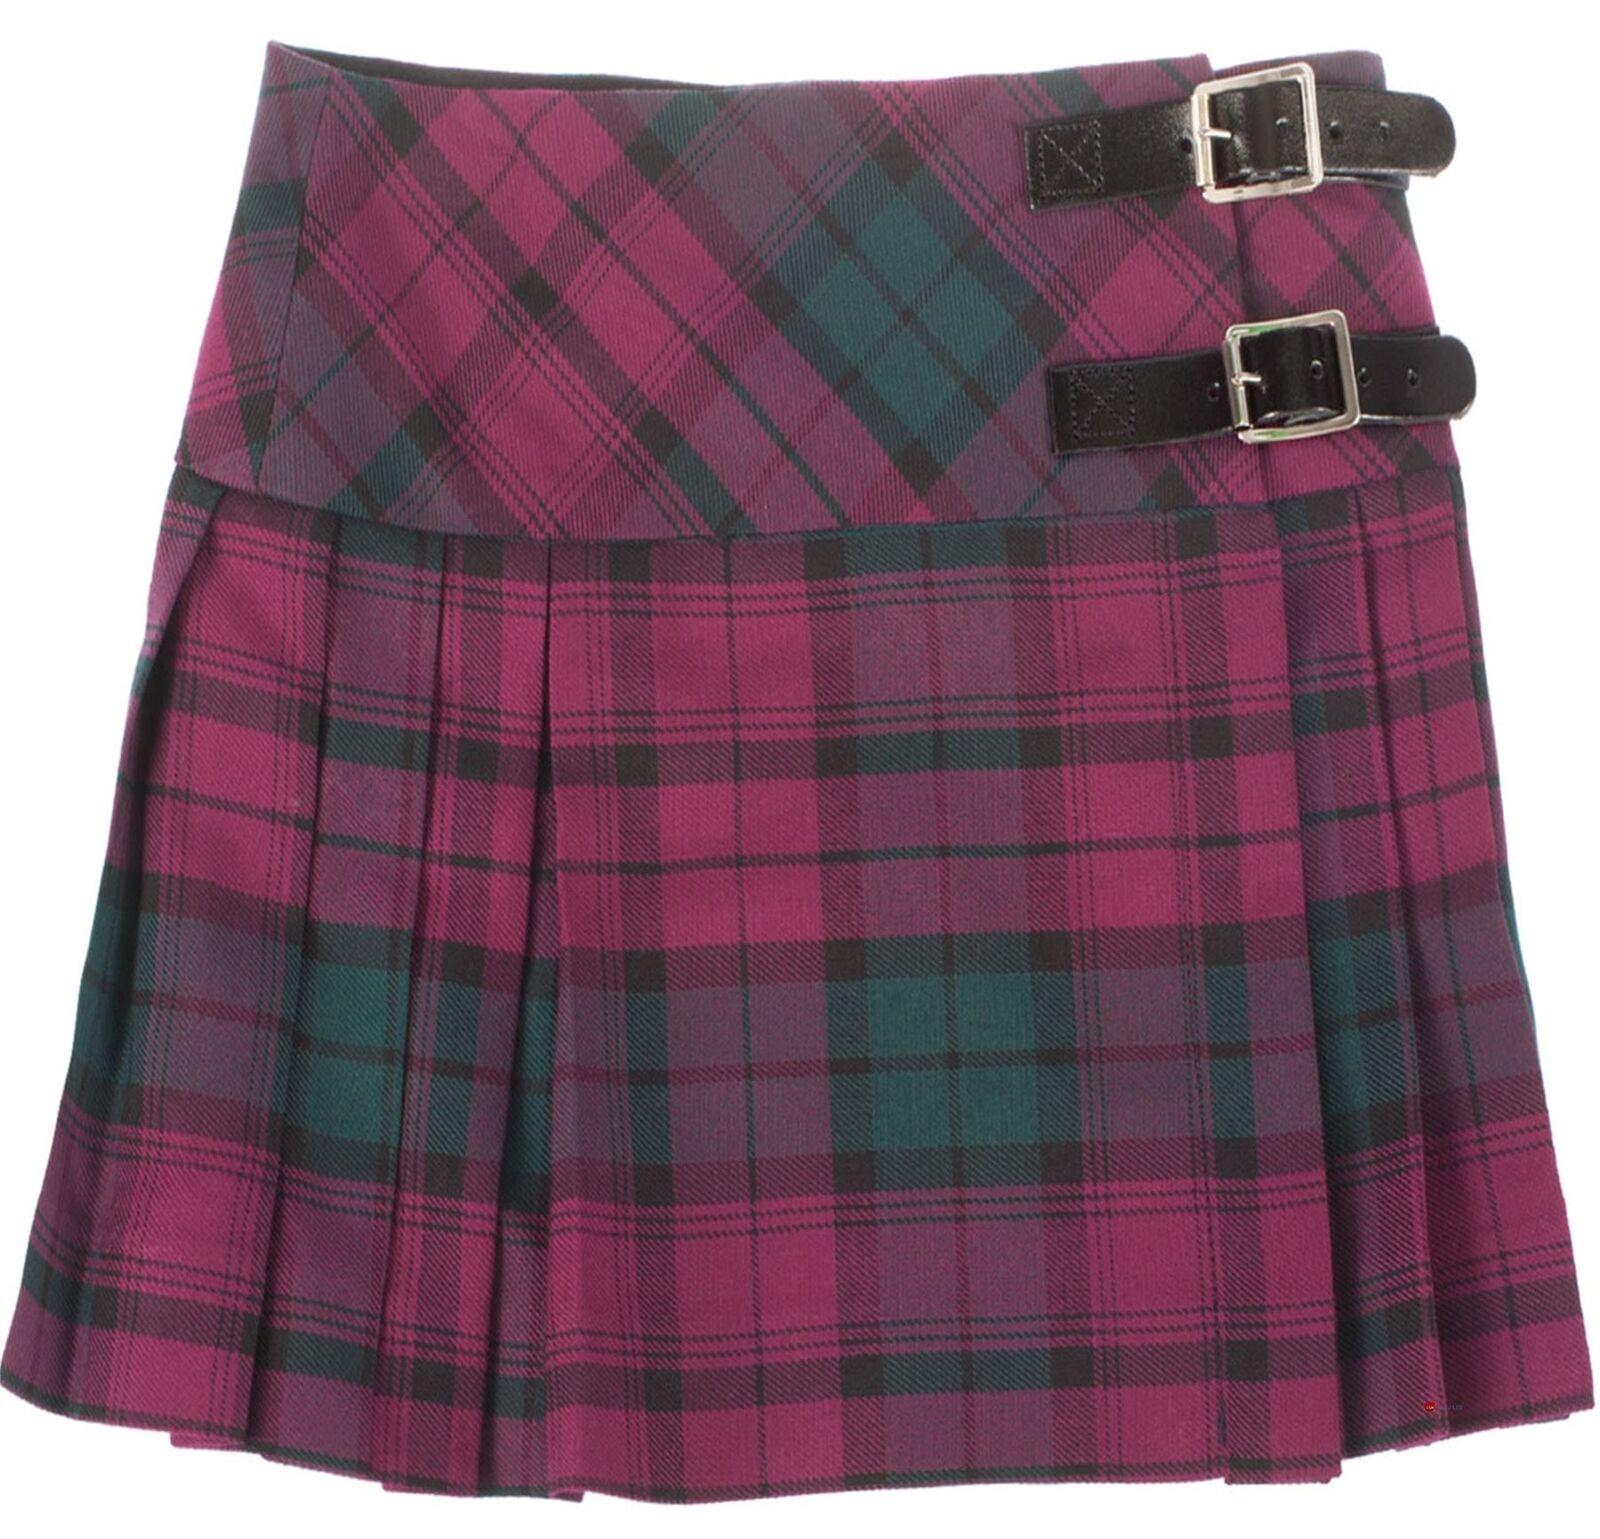 Girls Pure Wool Billie Kilt Skirt in Lindsay Tartan